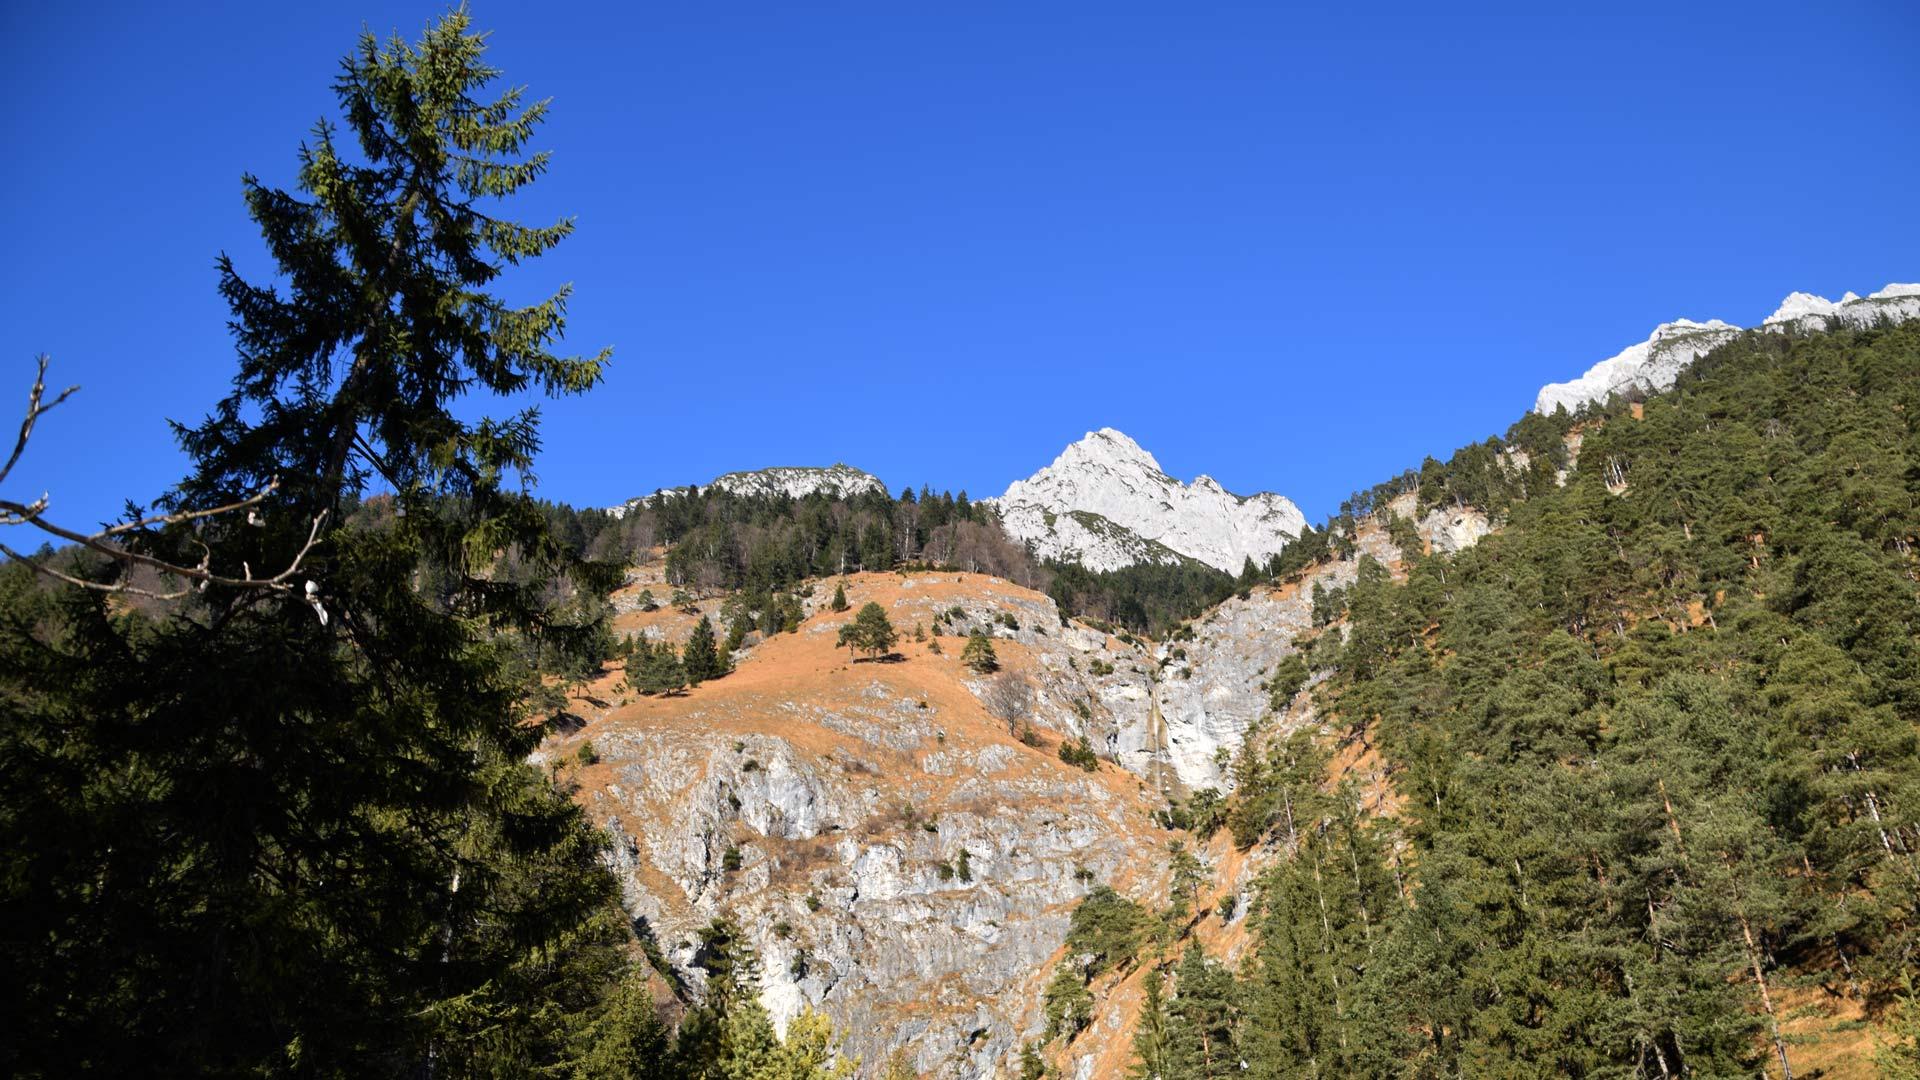 Fallbach Klettersteig Vorarlberg : Fallbach wasserfall wanderung in gnadenwald